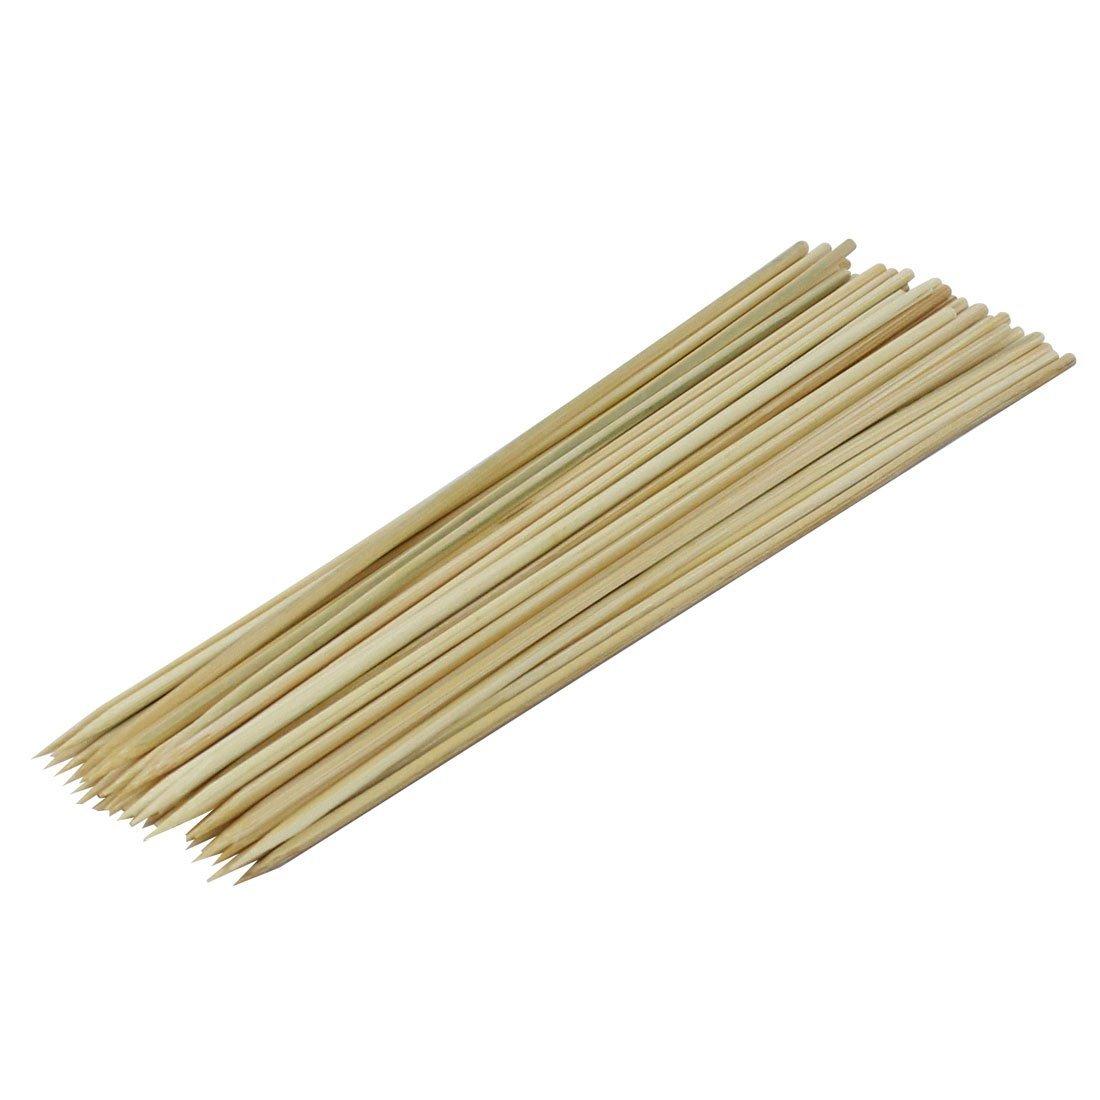 Amazon.com: eDealMax bambú Picnic Hot Dog aguja de la barbacoa del palillo DE 25 cm de Largo 50 piezas Beige: Home & Kitchen